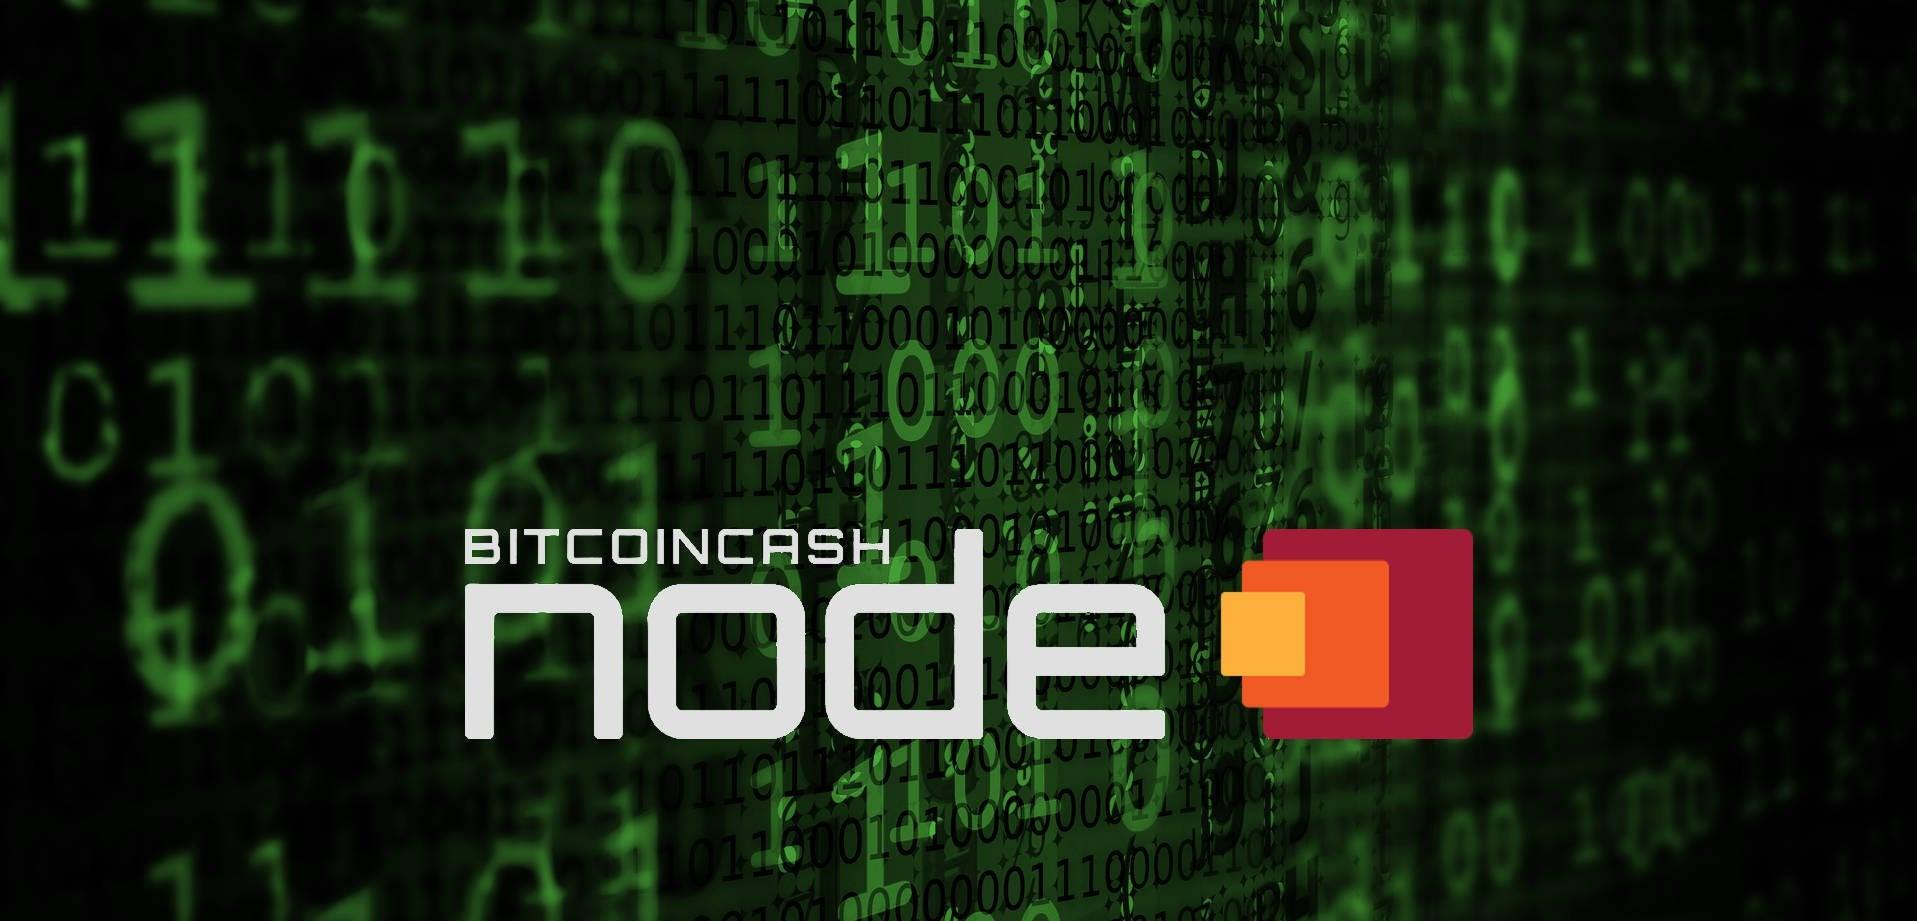 BCHN Financial Report 2020-09-03 : Bitcoincash